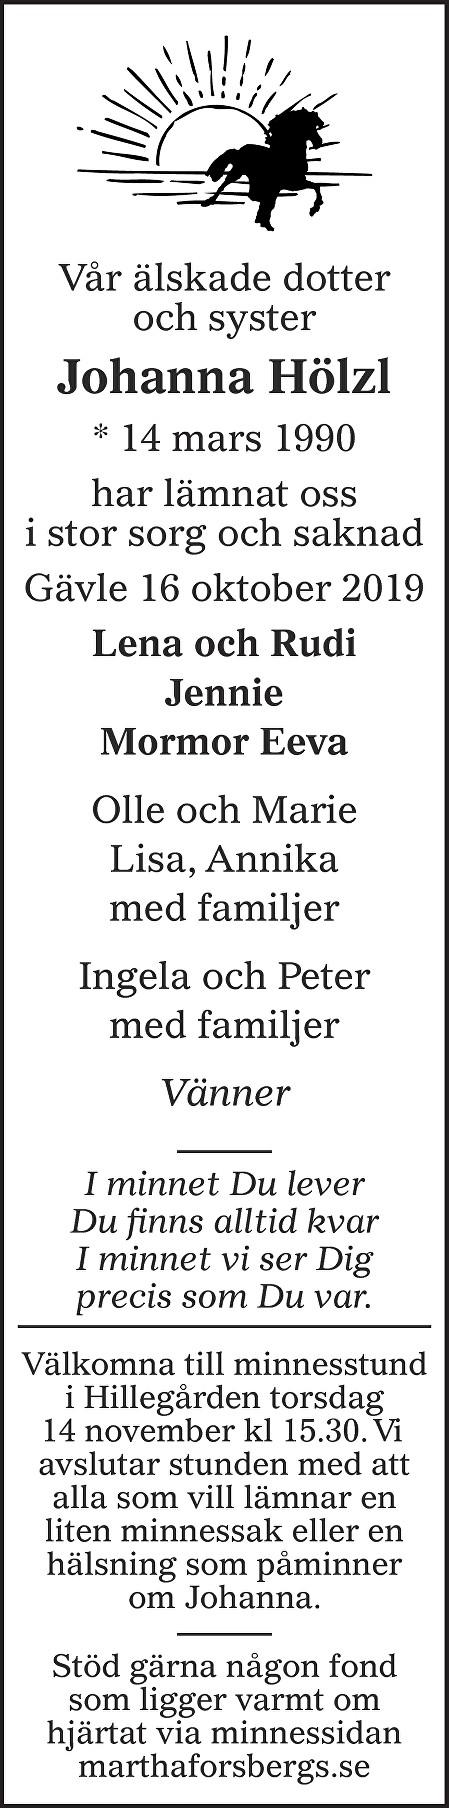 Johanna Hölzl Death notice